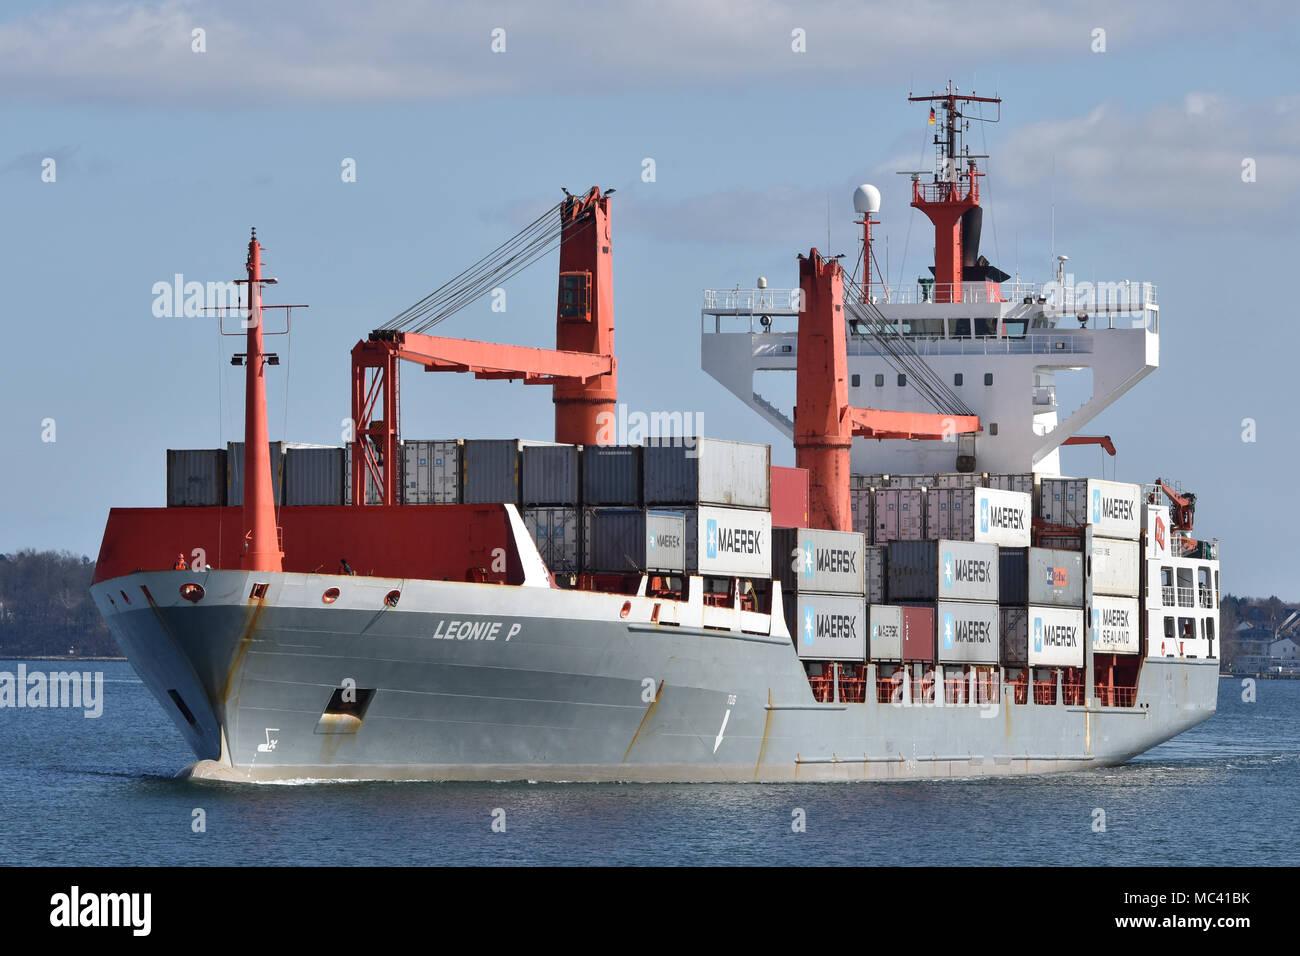 Feedervessel Leonie P entering the Holtenau locks (Kiel Canal) - Stock Image